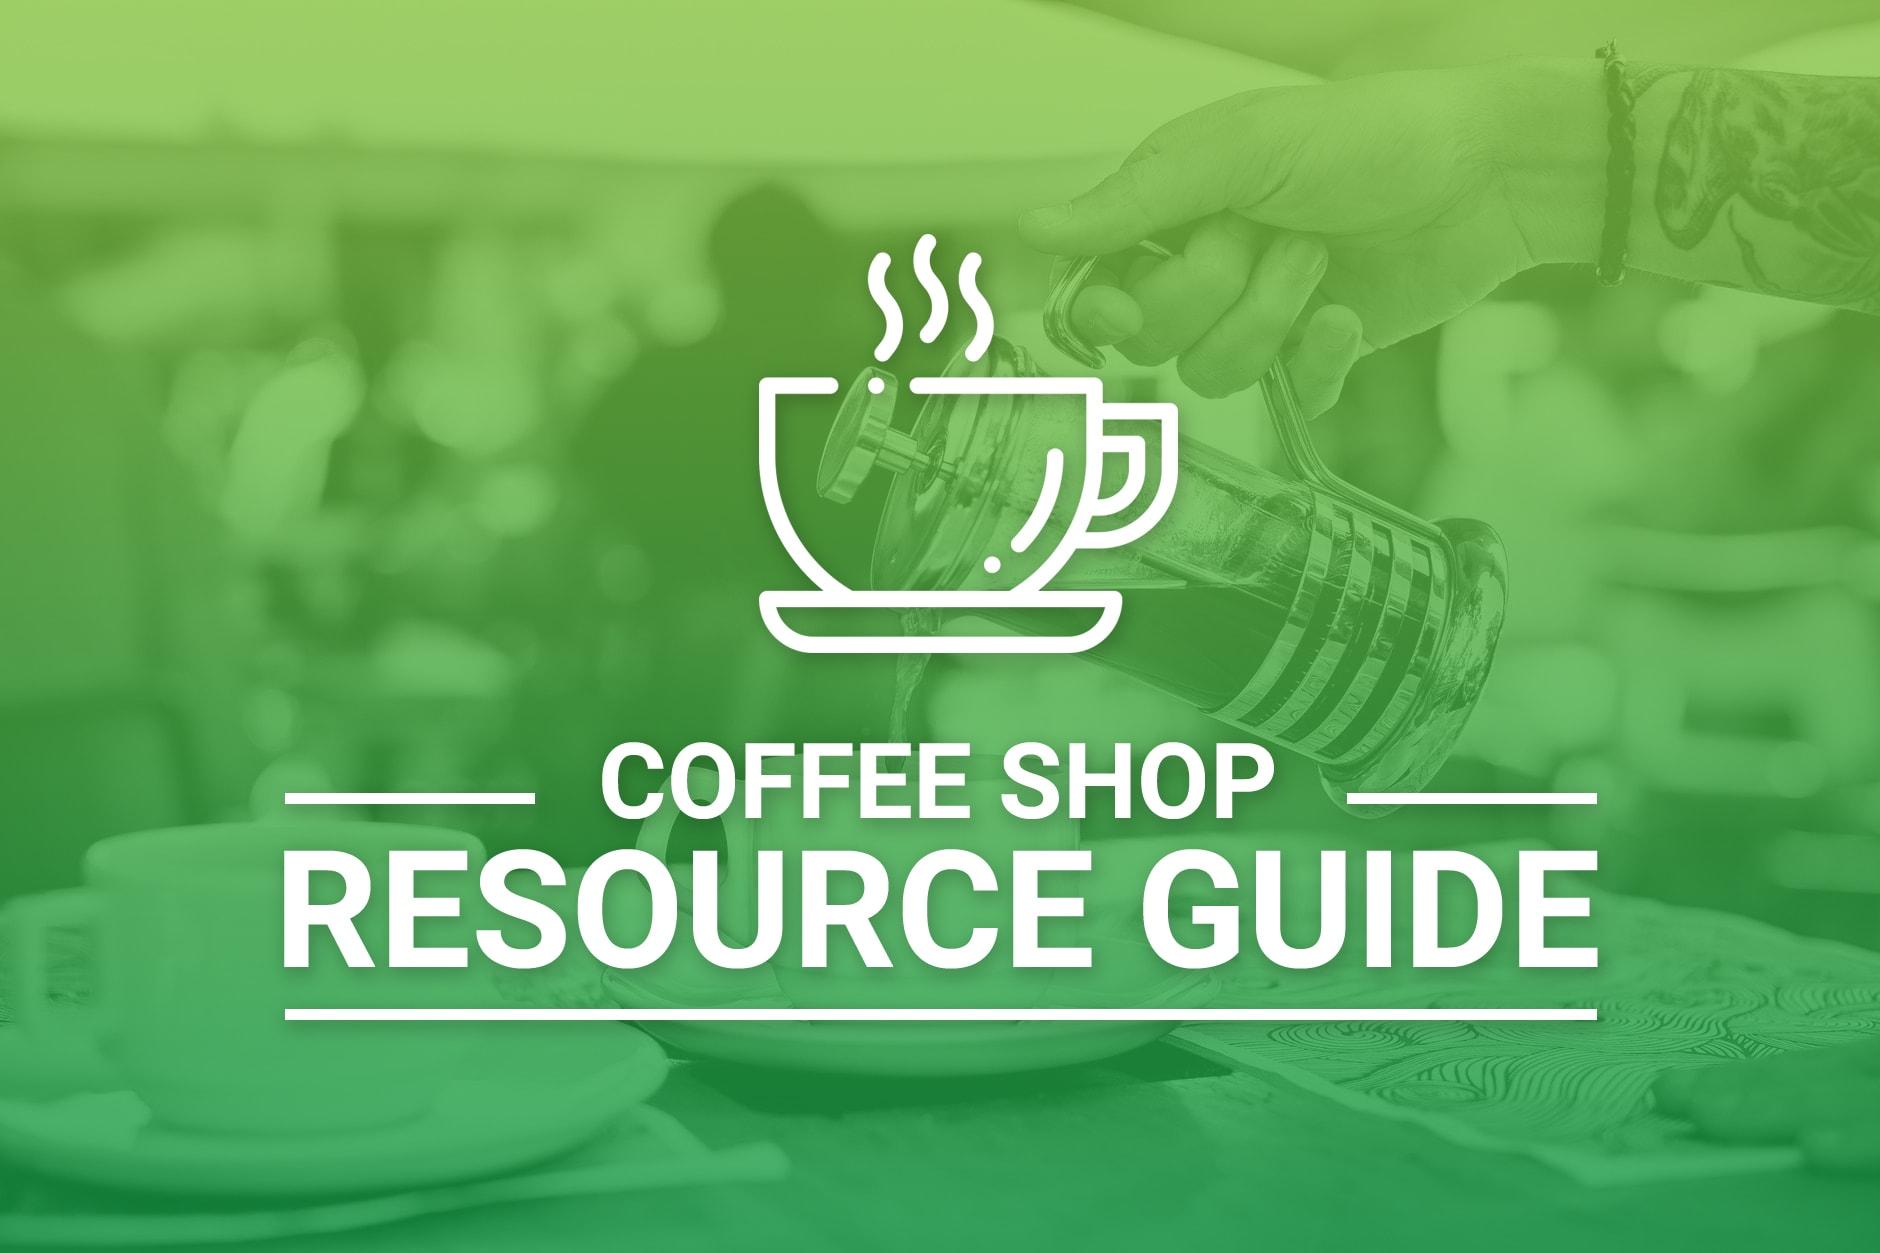 Coffee Shop Resource Guide